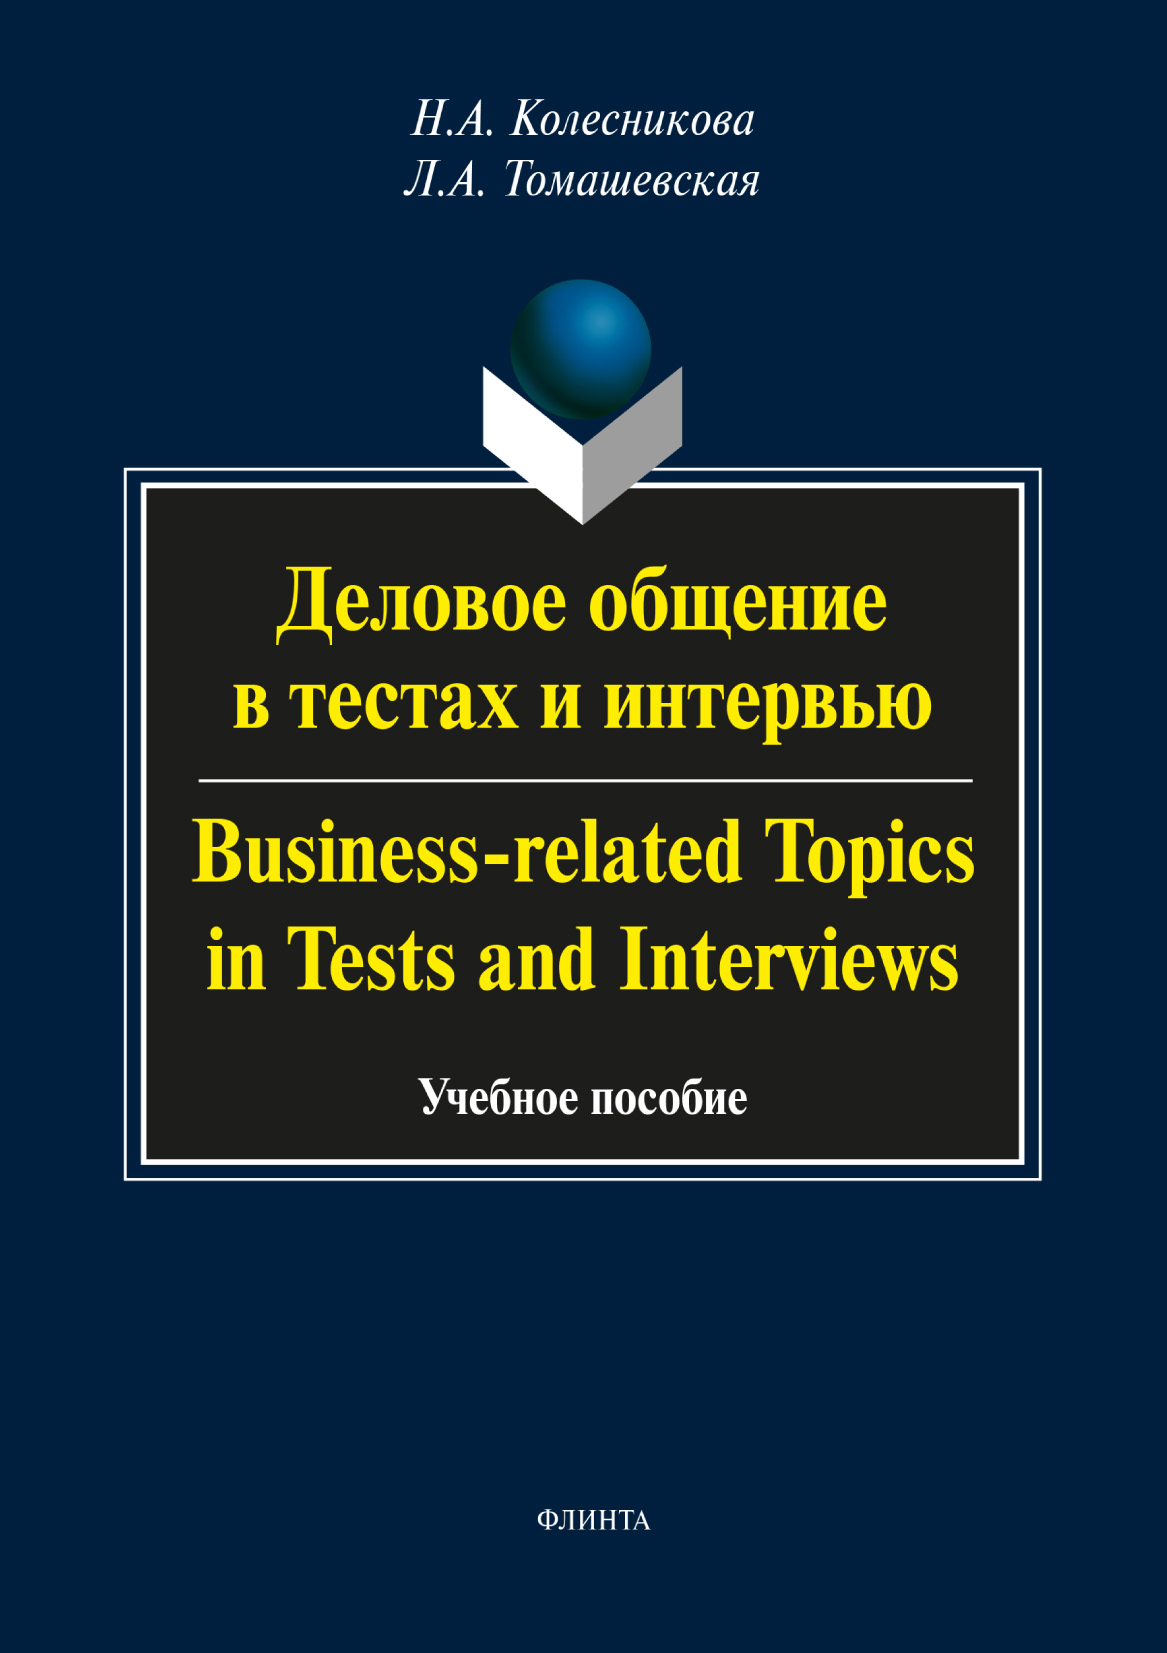 Н. А. Колесникова Деловое общение в тестах и интервью / Business-related Topics in Tests and Interviews